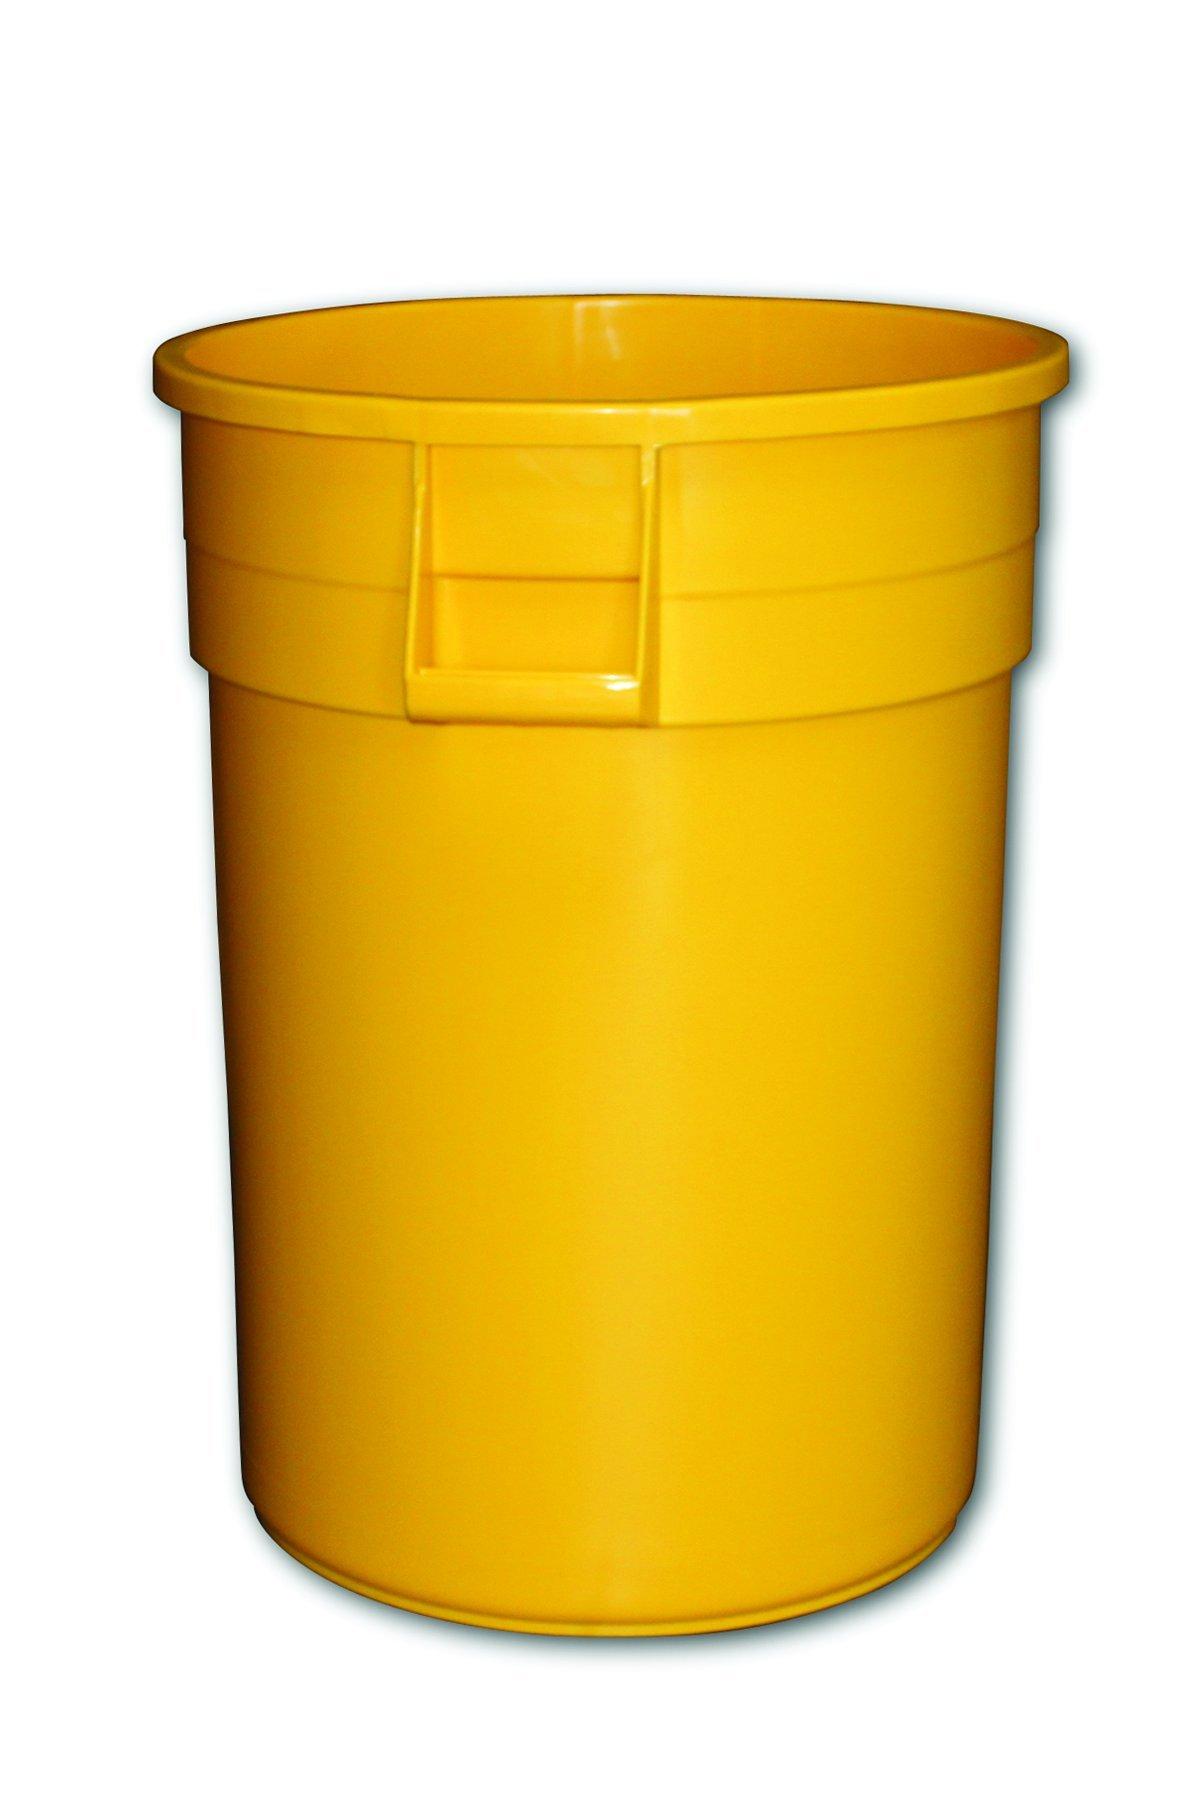 Impact 7744-16 Gator Plastic Container, 44 Gallon Capacity, 23-3/4'' Diameter x 31-5/8'' Height, Yellow (Case of 4)